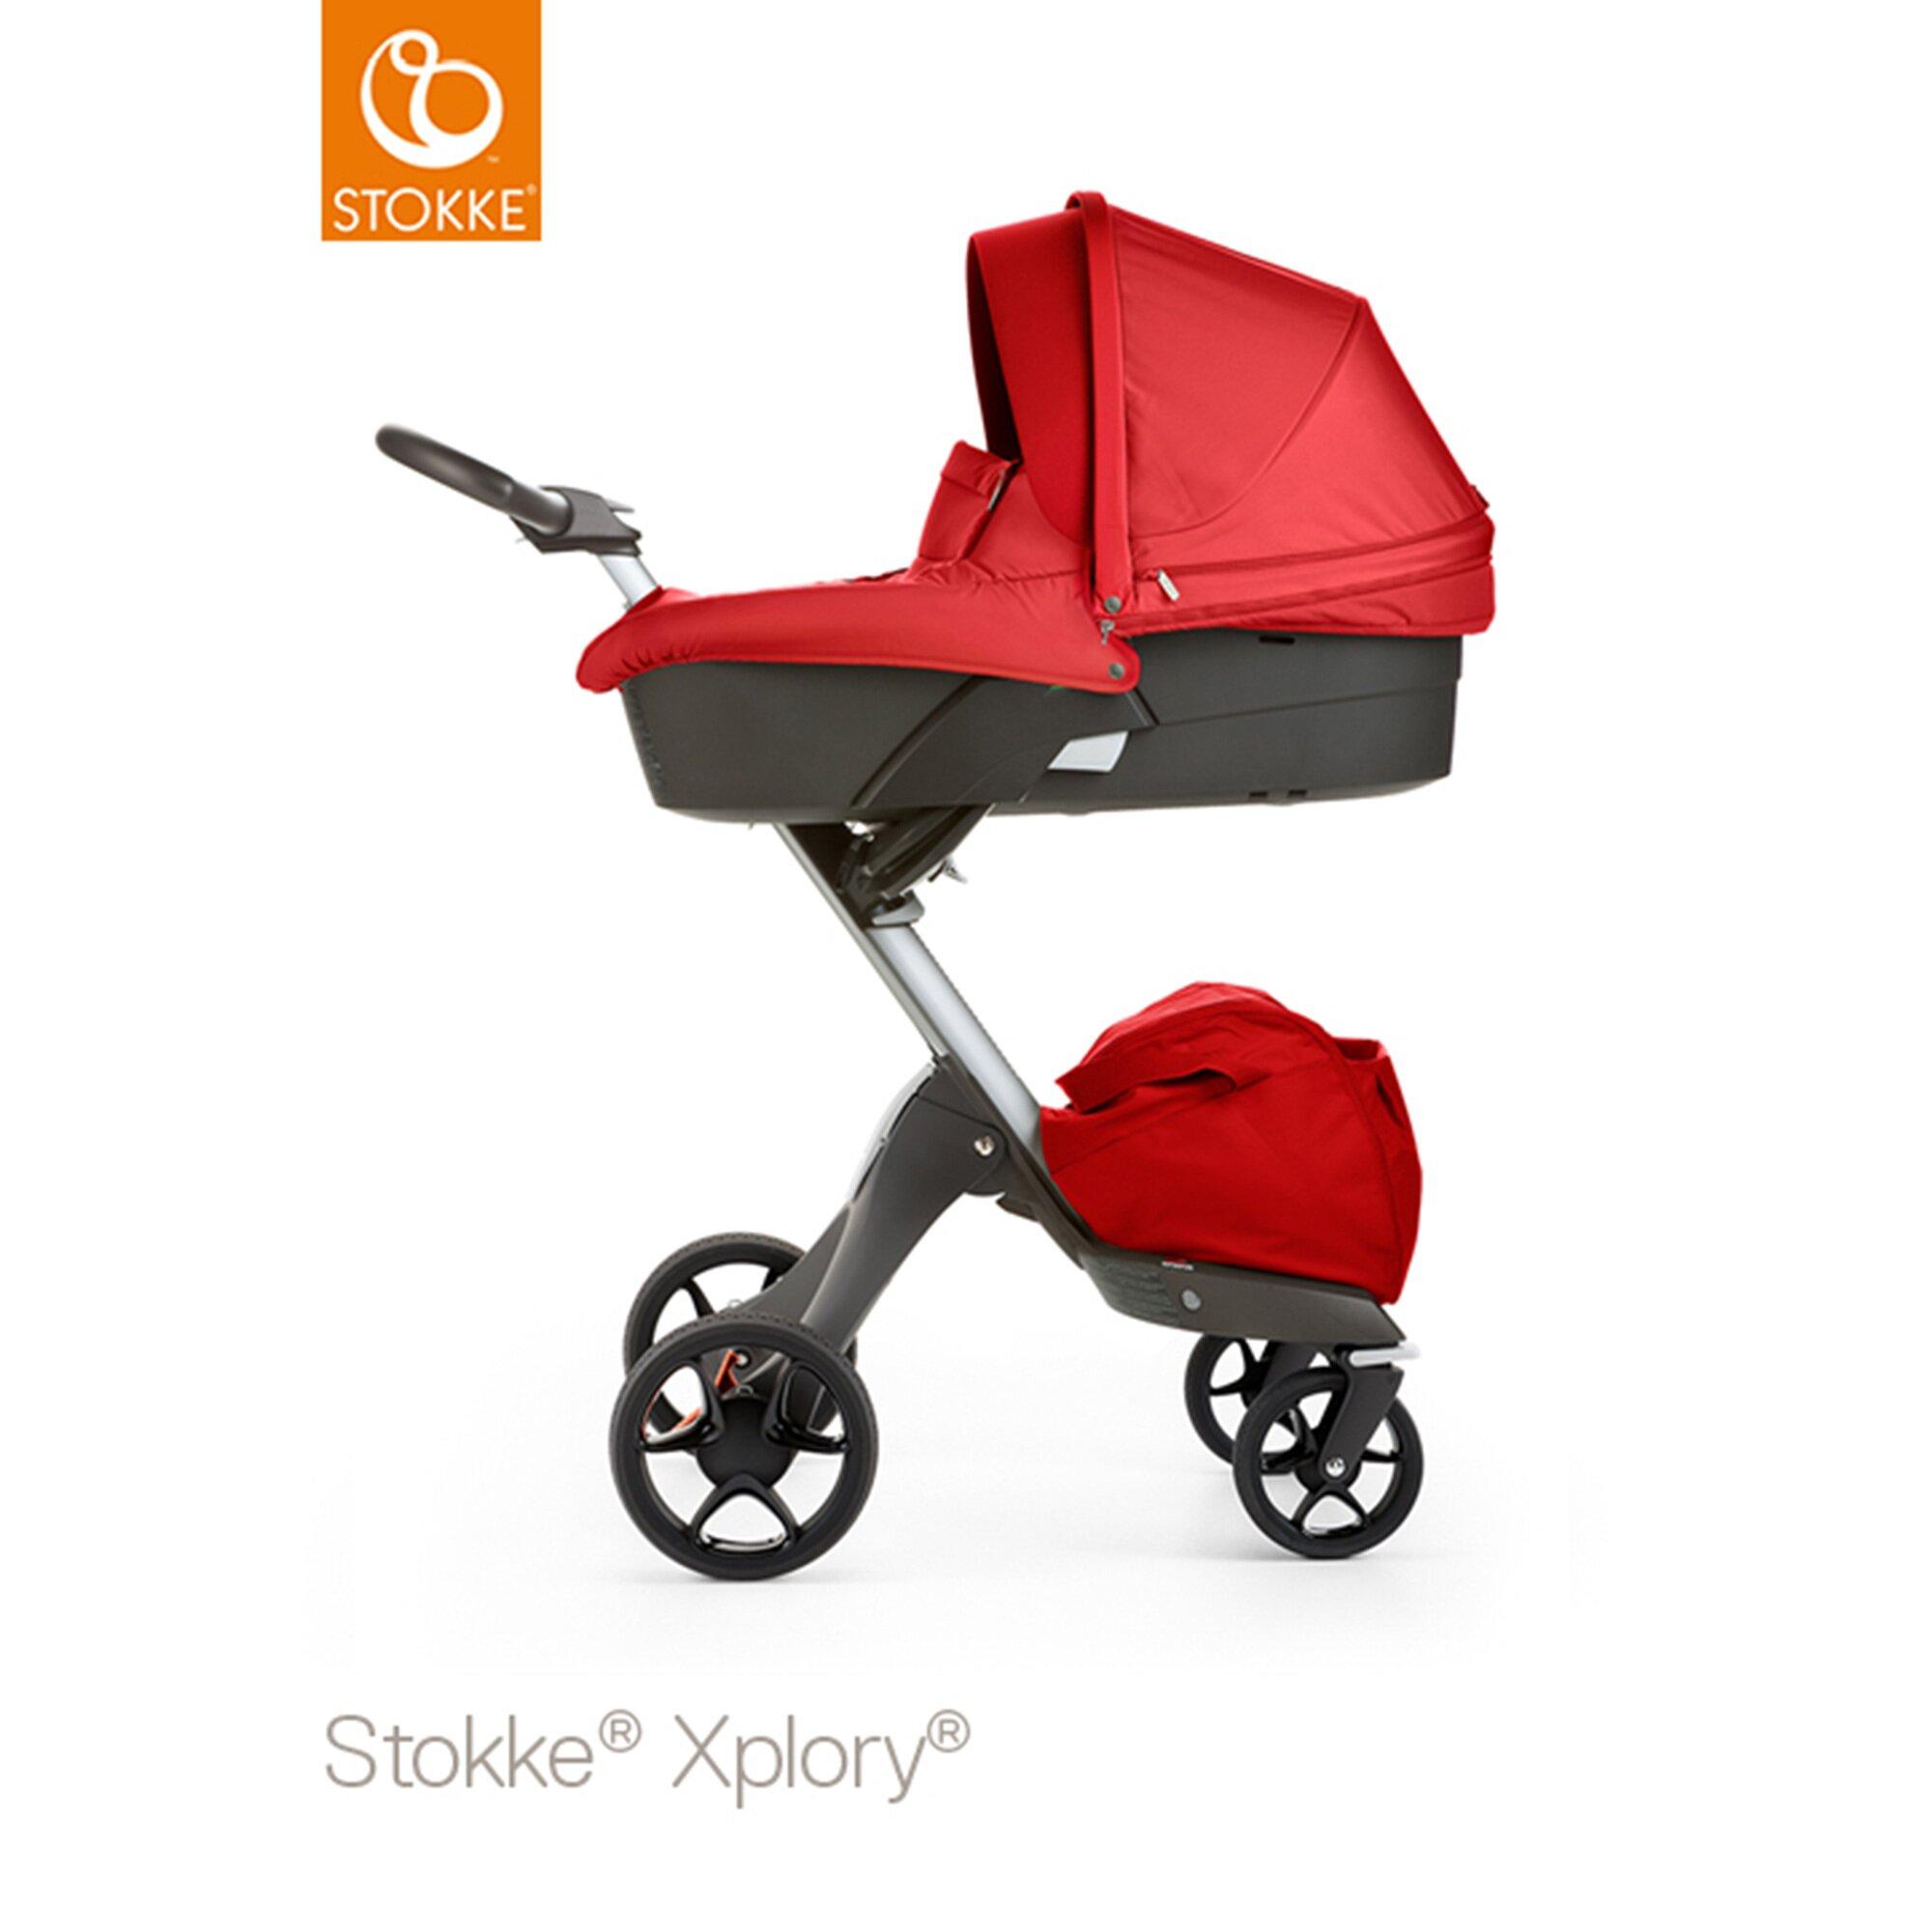 xplory-babyschale-xplory-